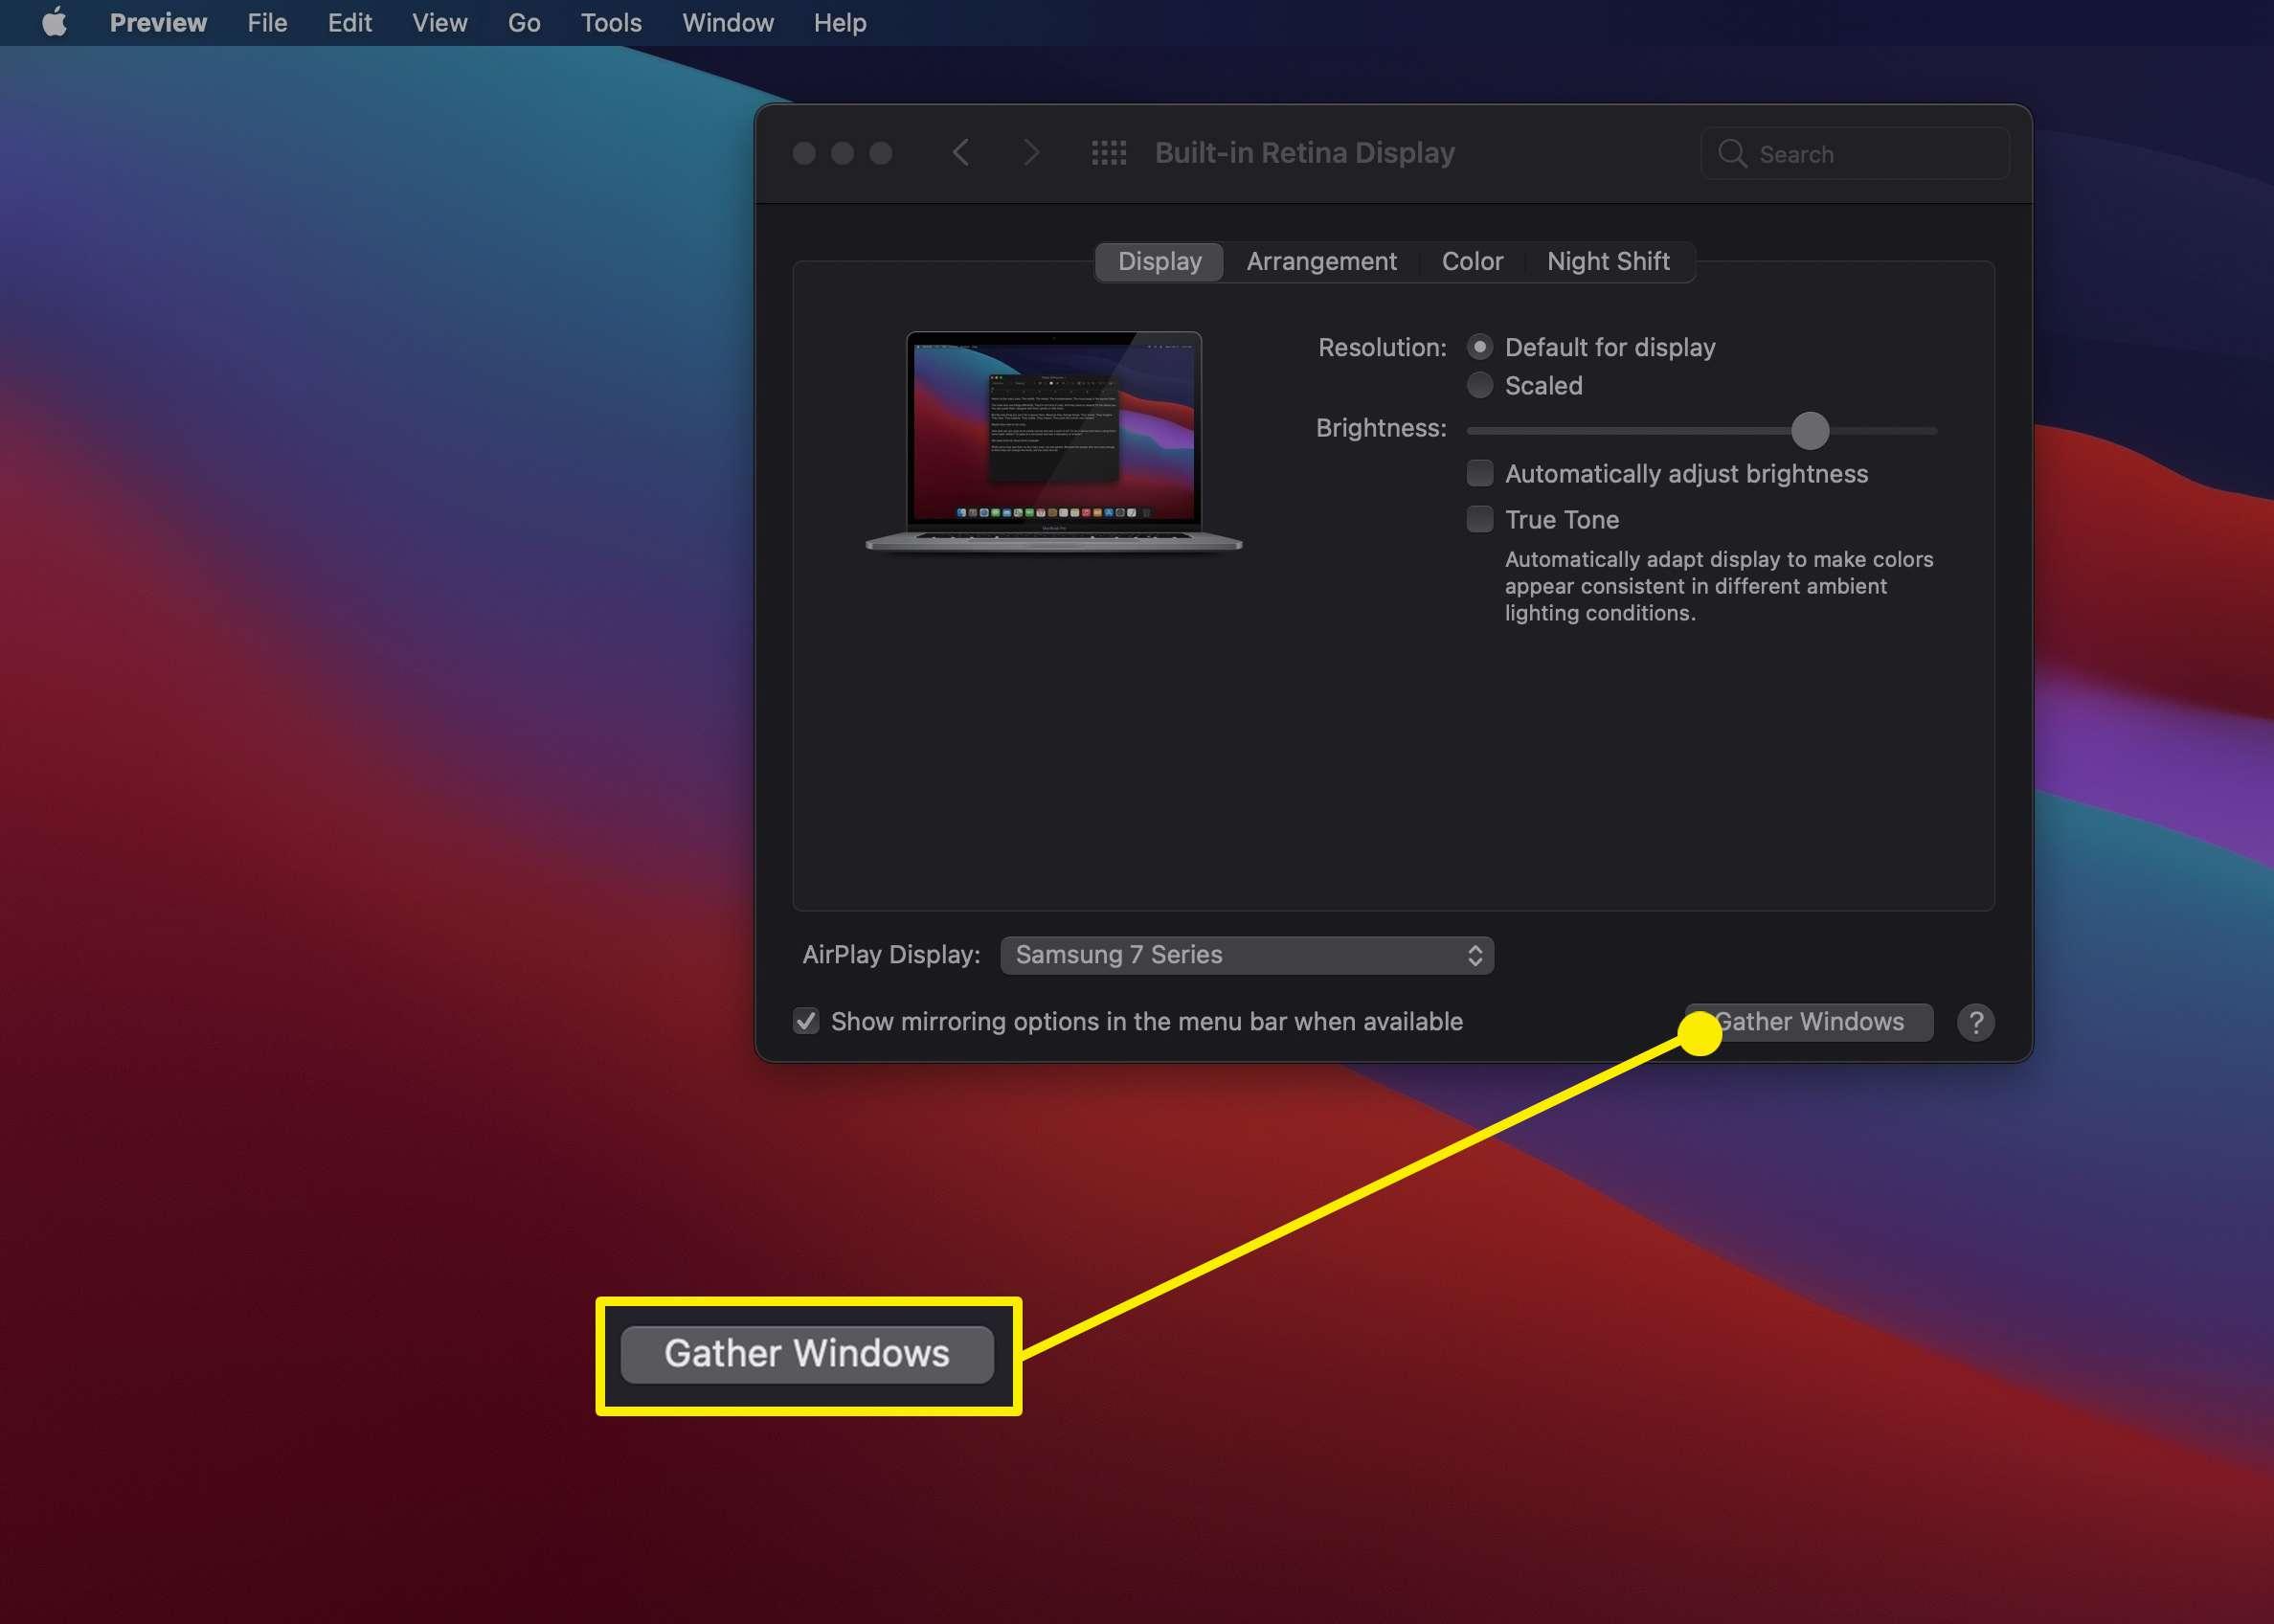 The Gather Windows option in a MacBook's Display Settings menu.